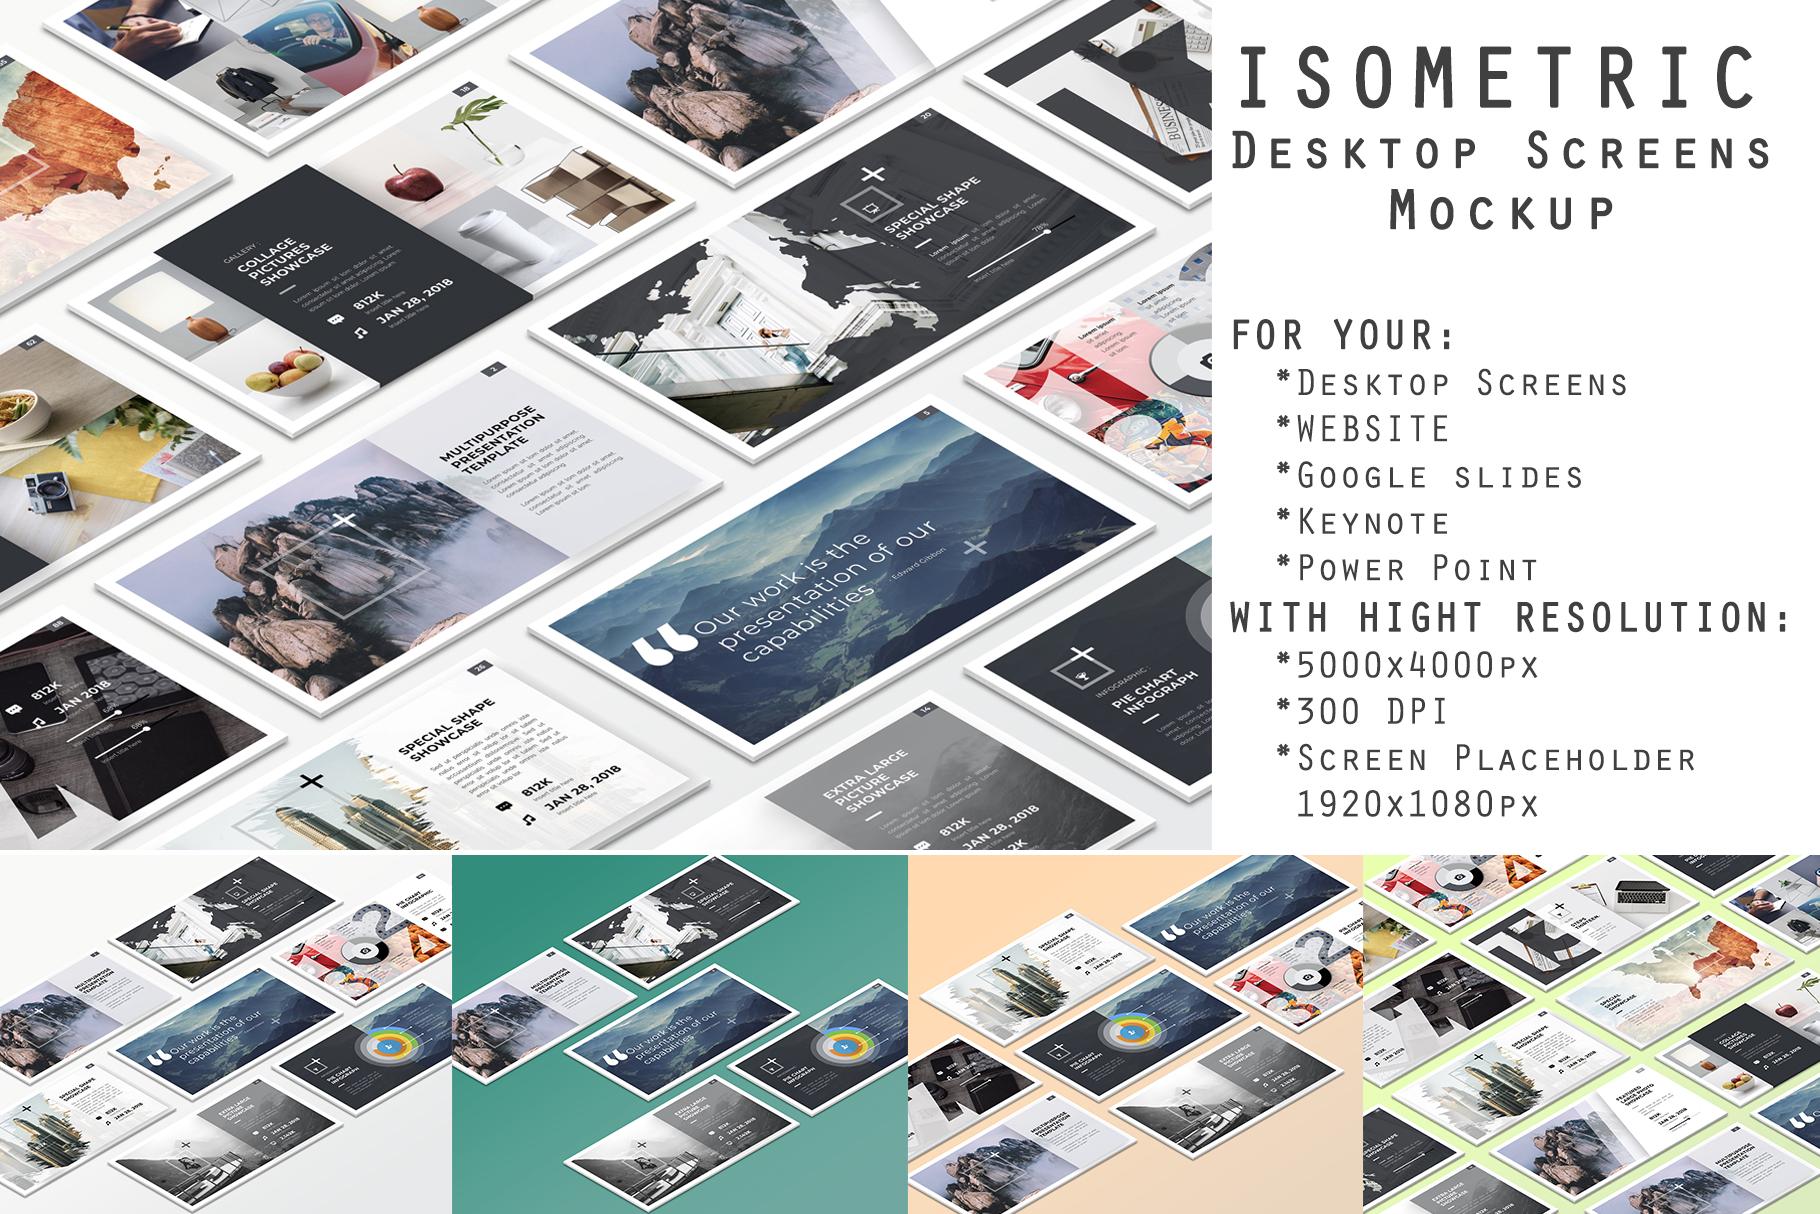 Isometric Desktop Screens Mockup V01 example image 1